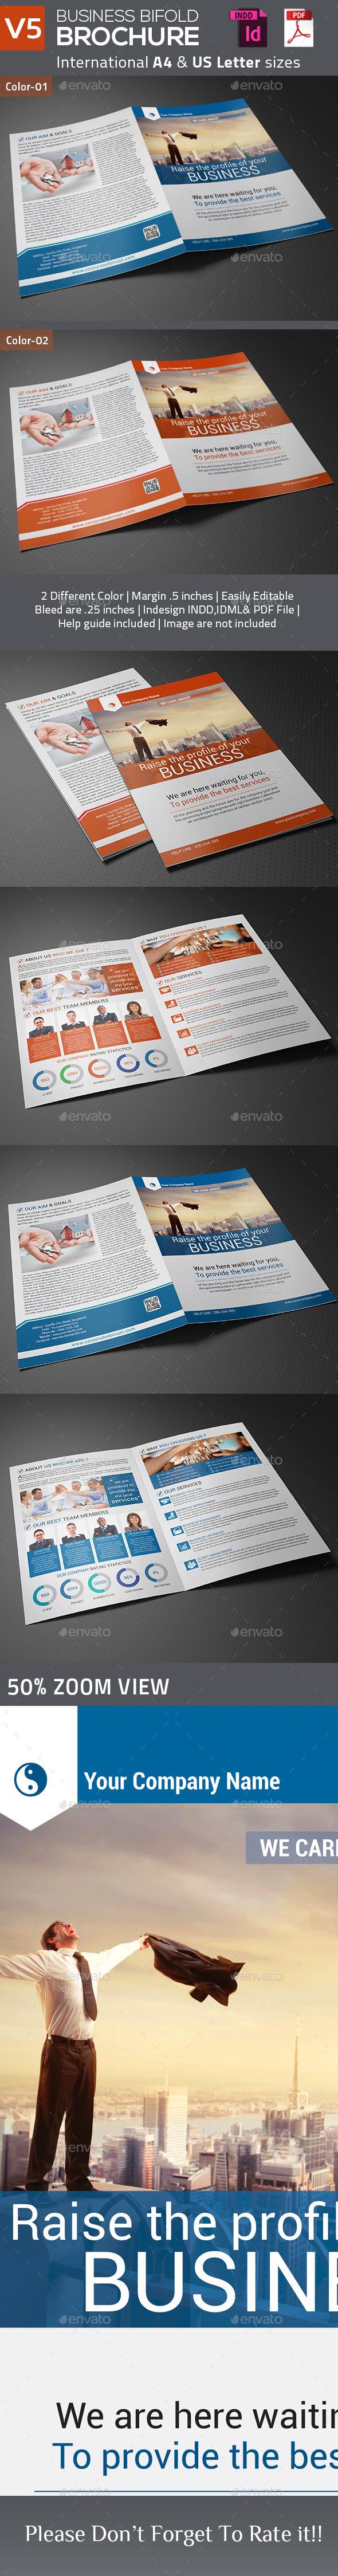 GraphicRiver Business Bifold Brochure V5 9908028